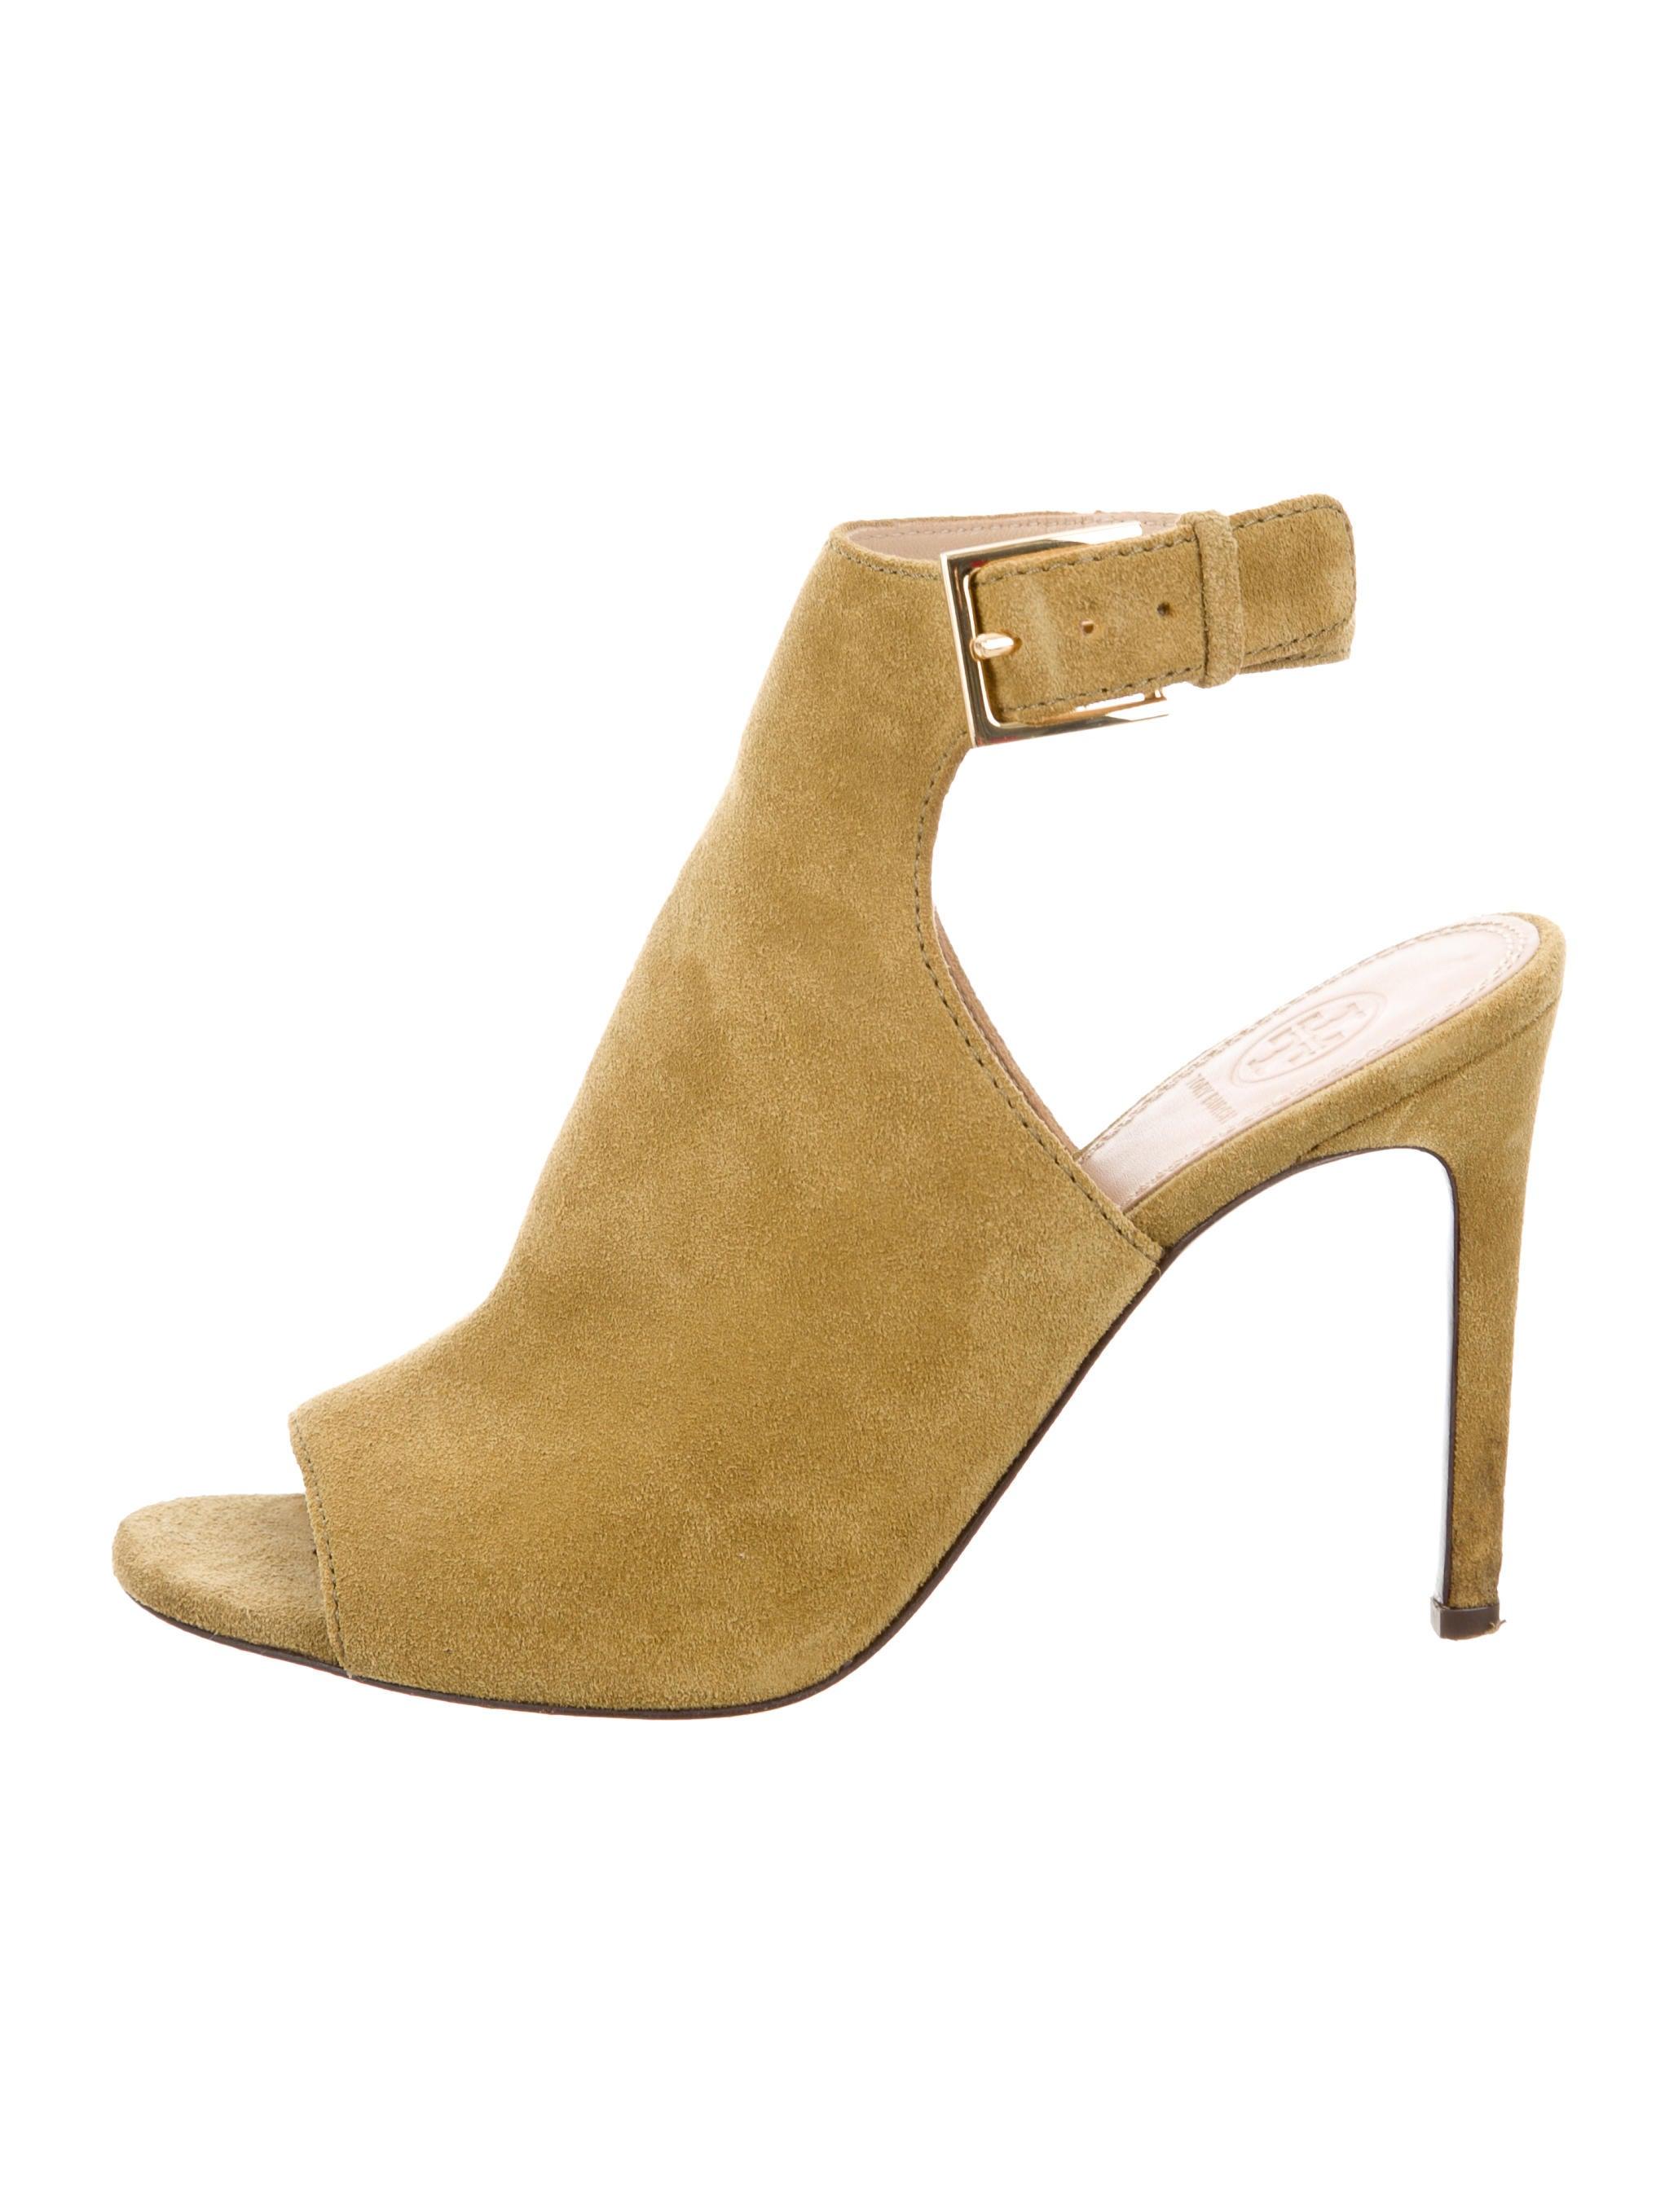 b9cdaf10f Tory Burch Suede Peep-Toe Booties - Shoes - WTO83429